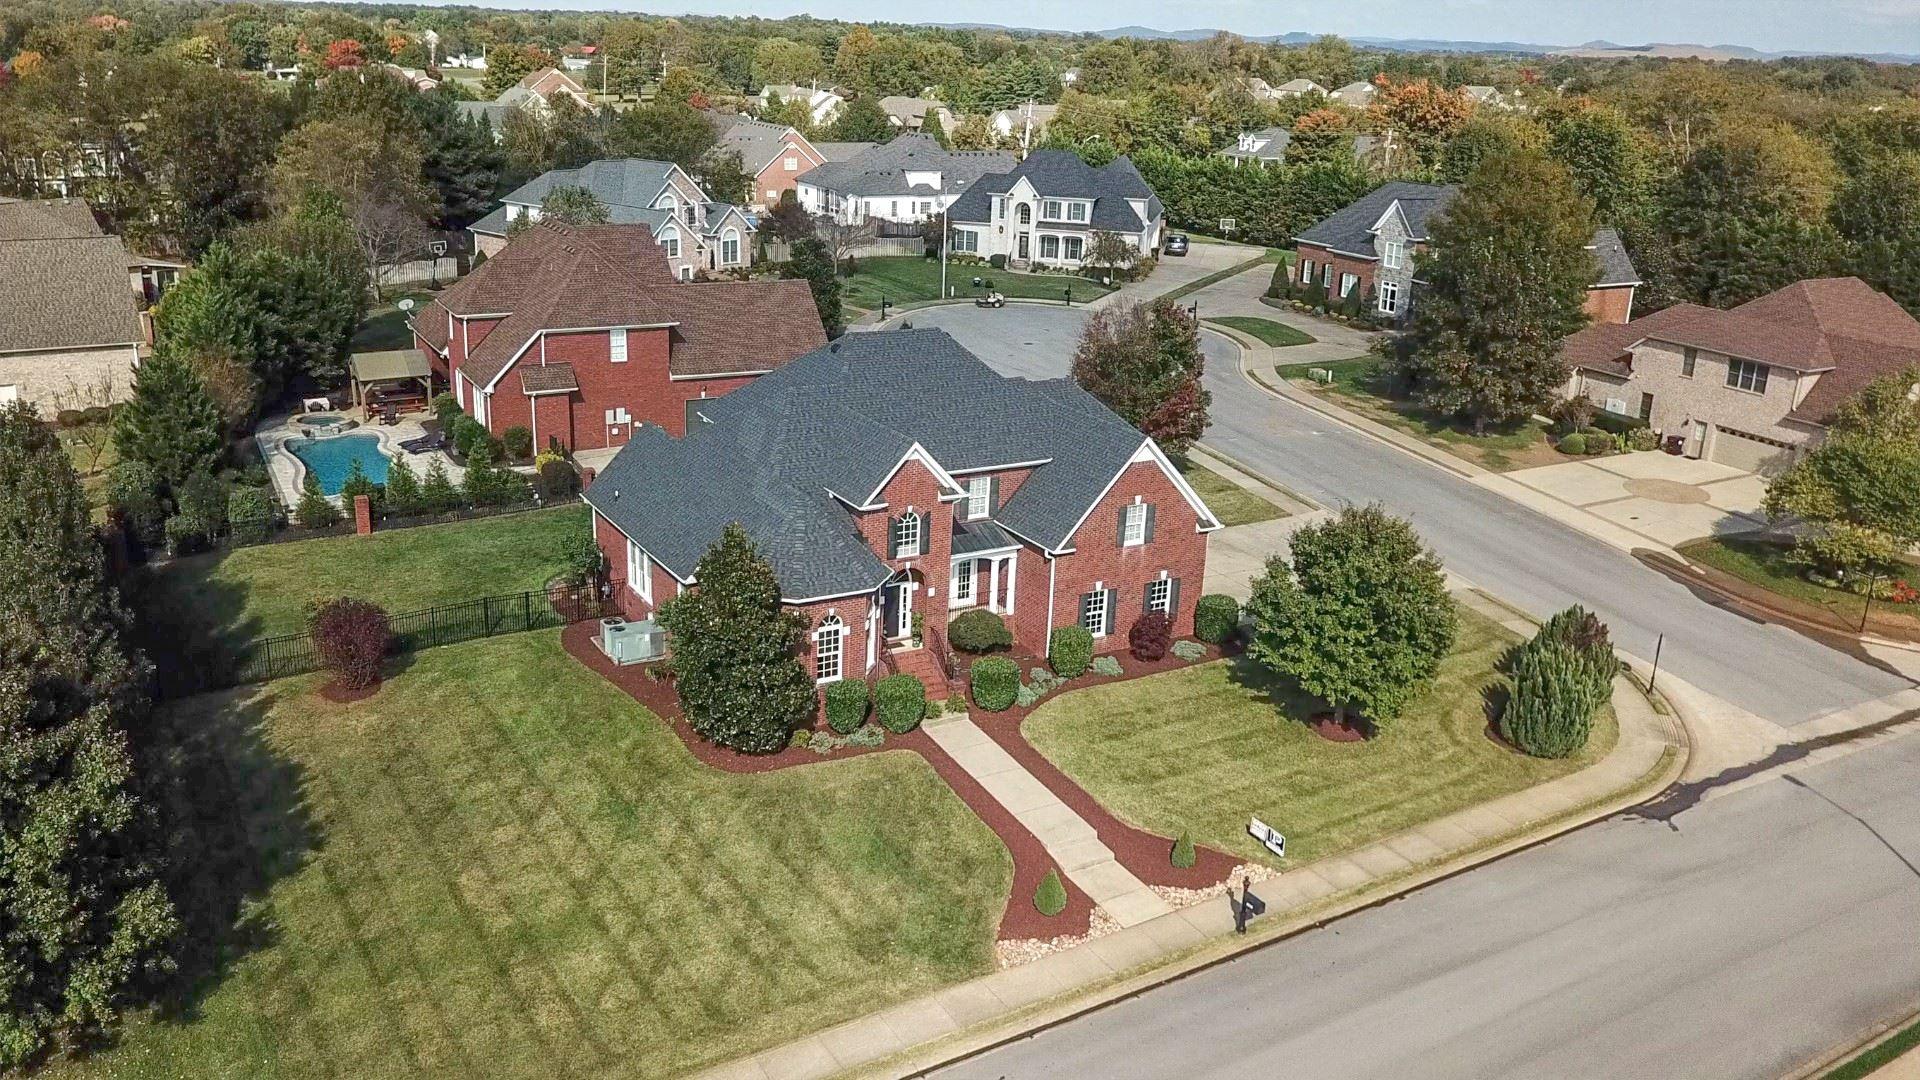 2216 Oakleigh Dr, Murfreesboro, TN 37129 - MLS#: 2197966